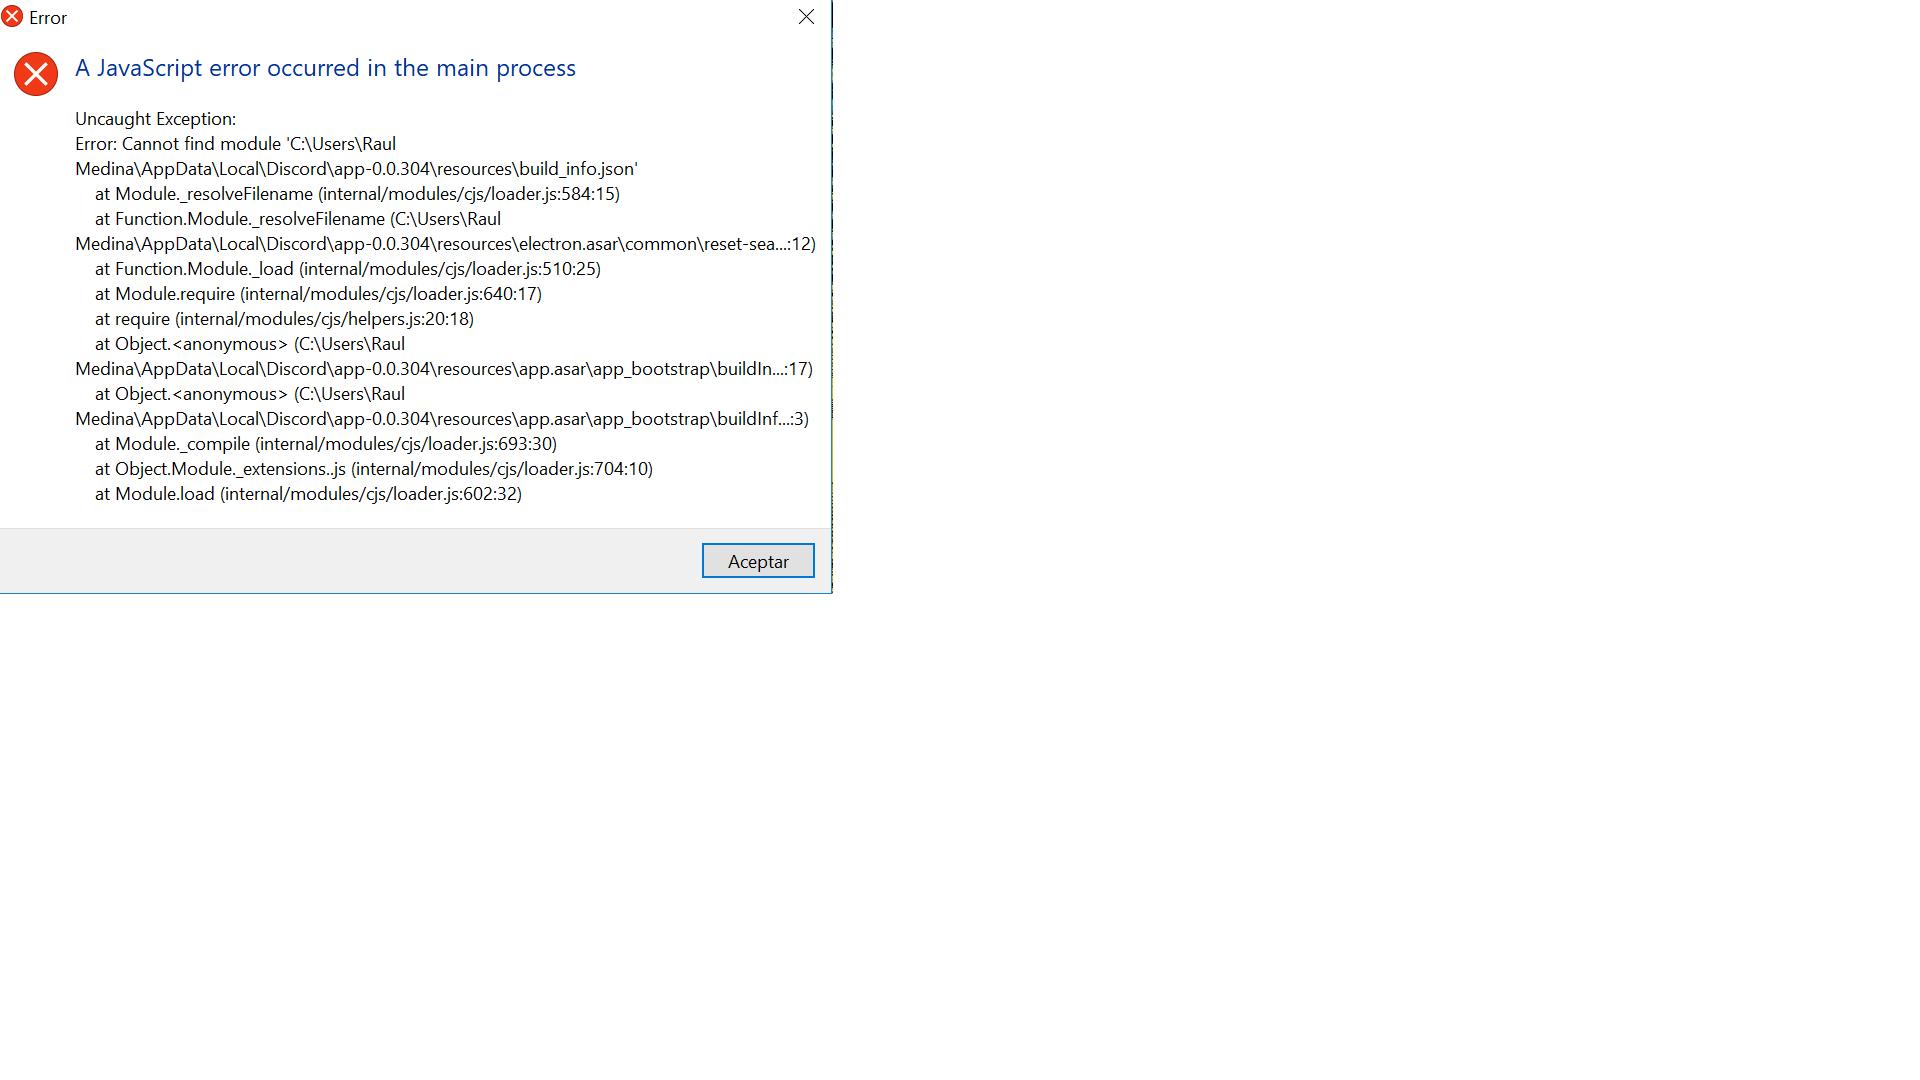 help for the error javascript error in the main process 4719e87f-8dd0-481a-a425-87dde6469425?upload=true.png